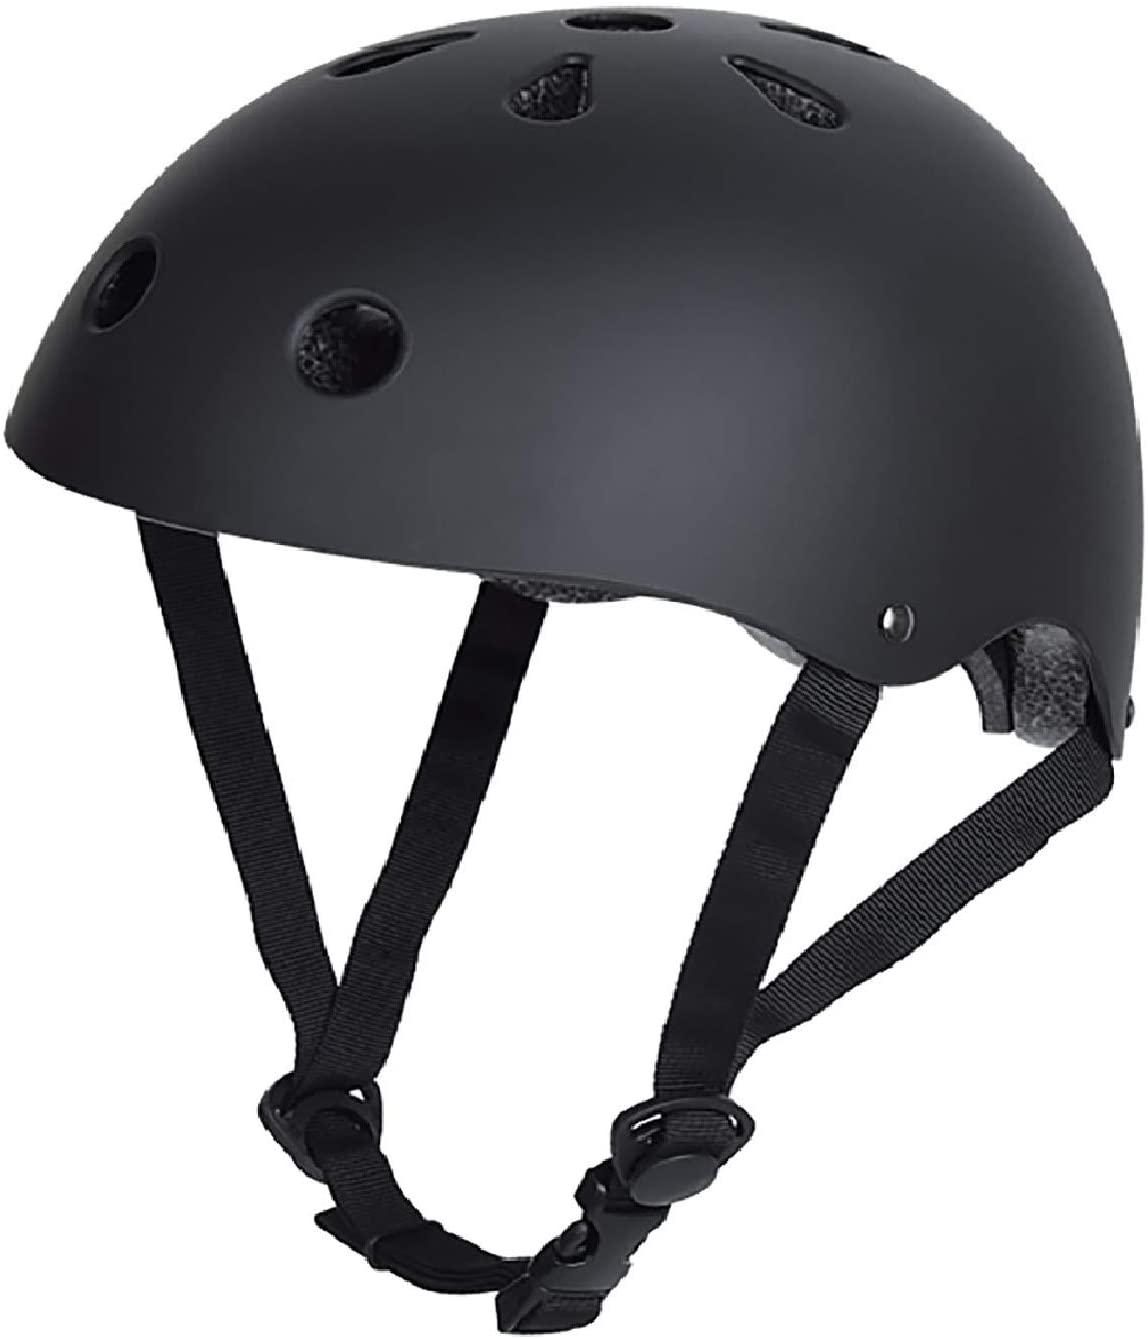 QiSa Dual Certified Skateboard Helmet Multi-Sports Cycling Skateboarding Scooter Roller Skate Inline Skating Rollerblading Longboard… (Black, Large)